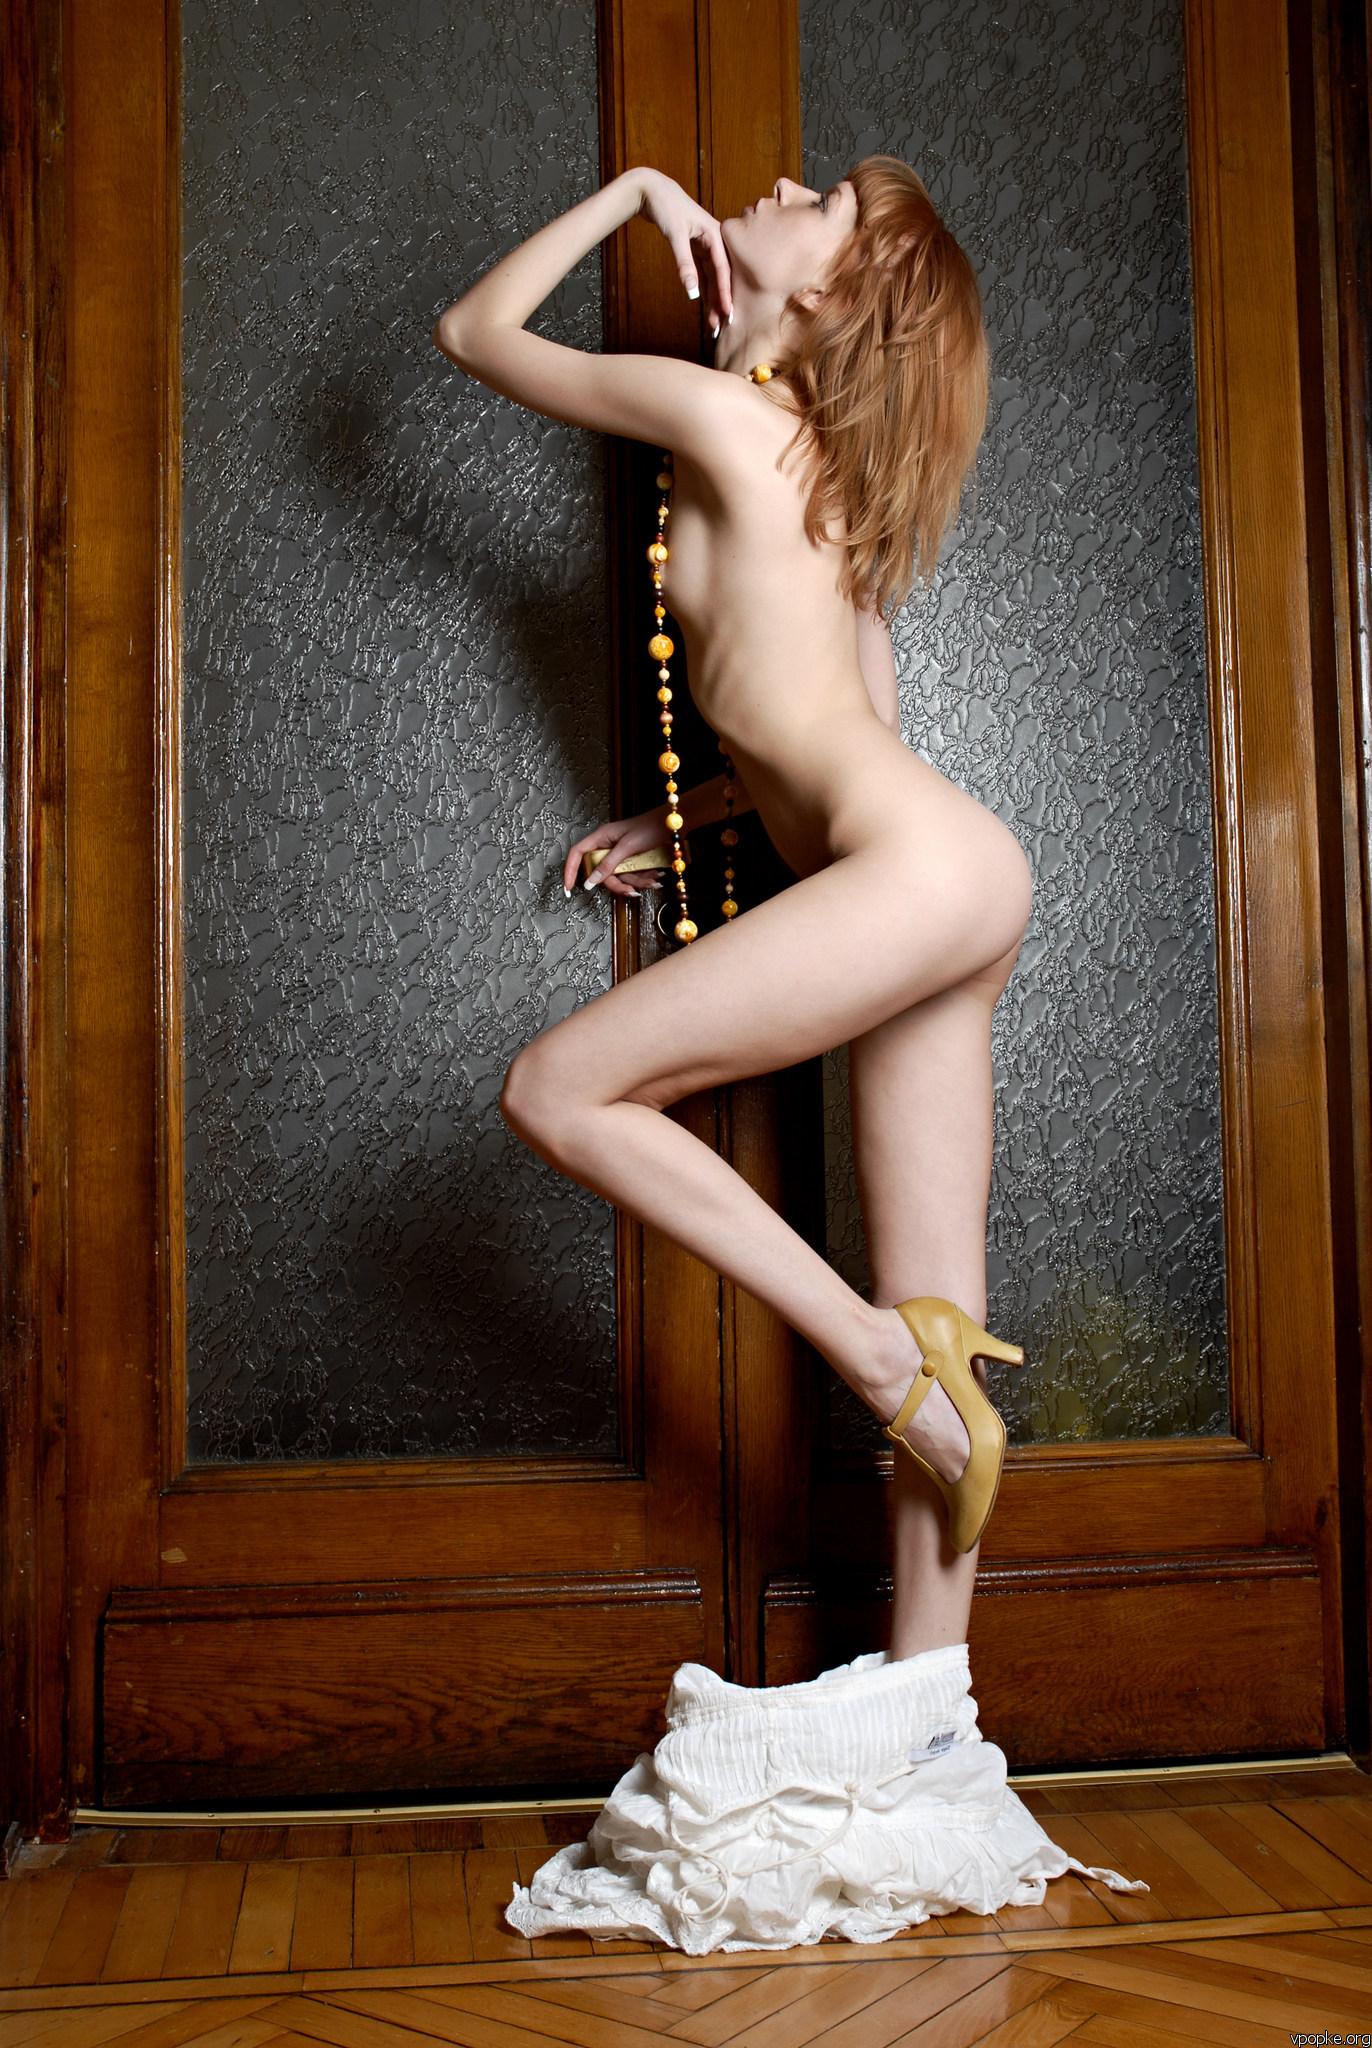 https://boobsmo.com/content/196/boobsmo_com_0000__65.jpg